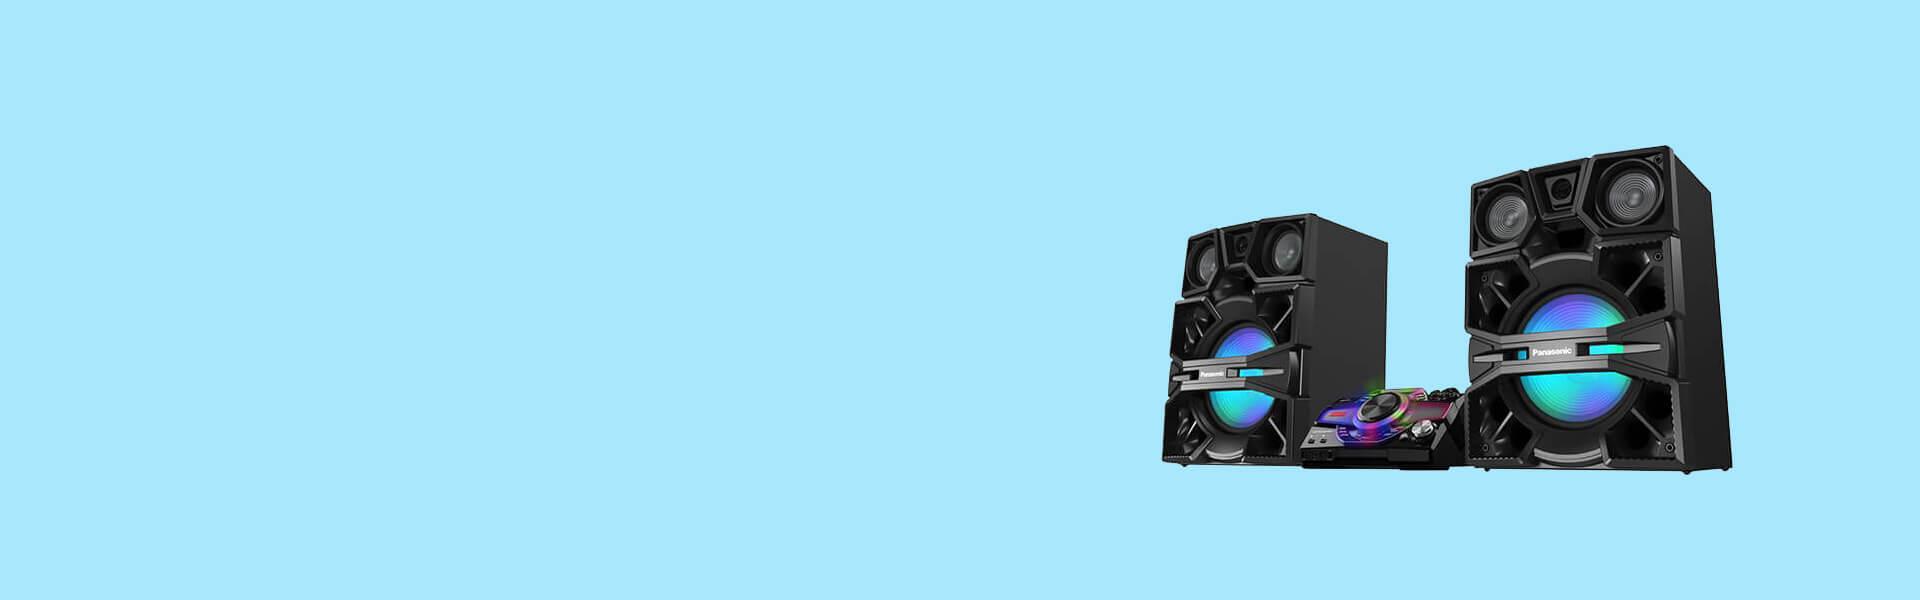 Tv and Audio Visual